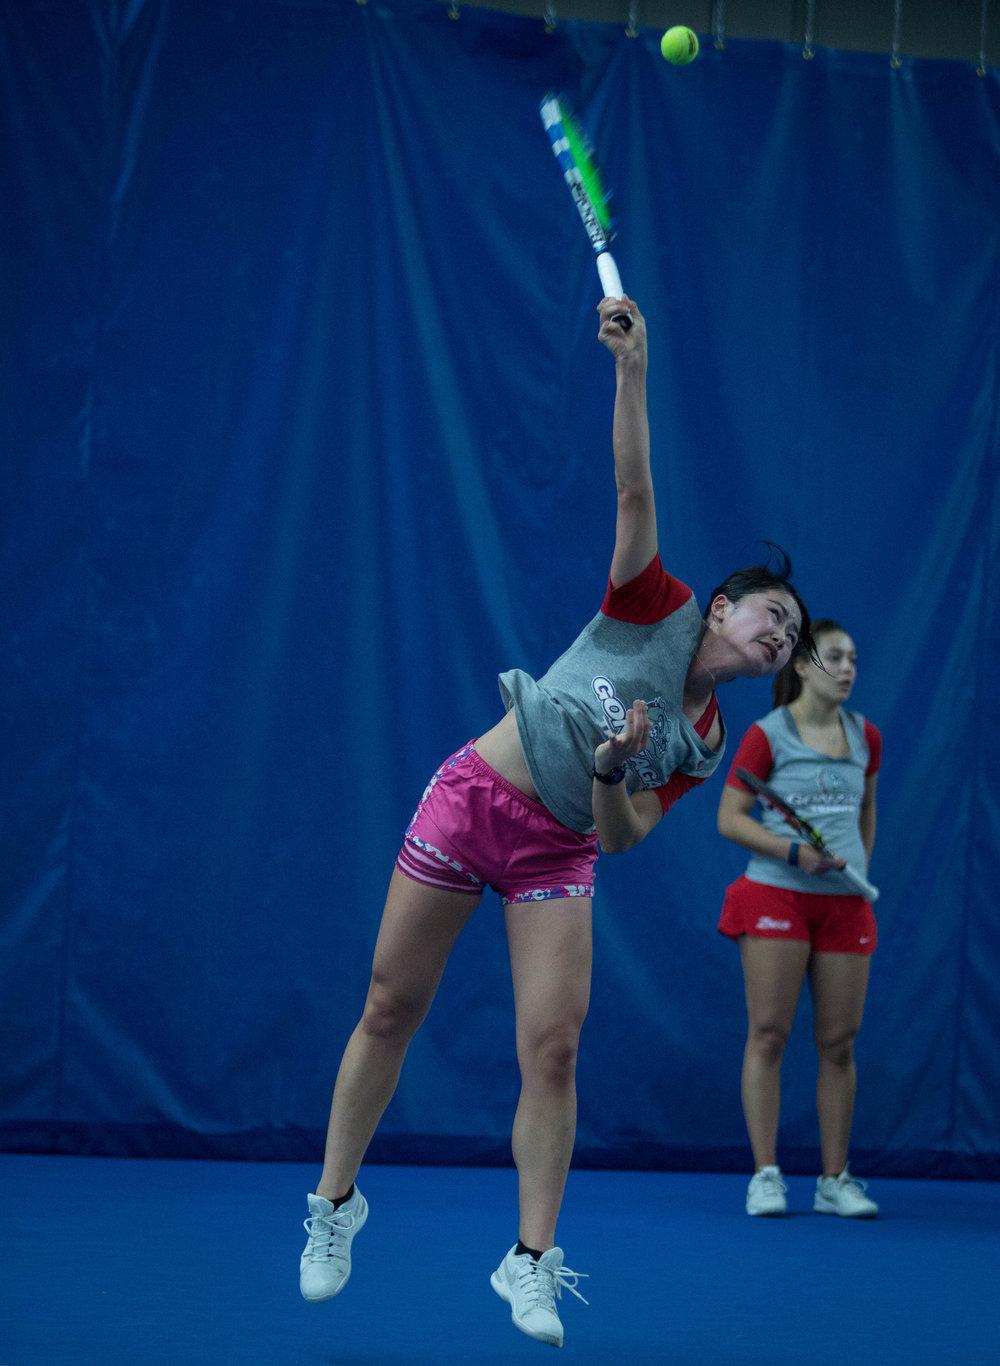 20170123- Tennis Preview- GML-6.jpg